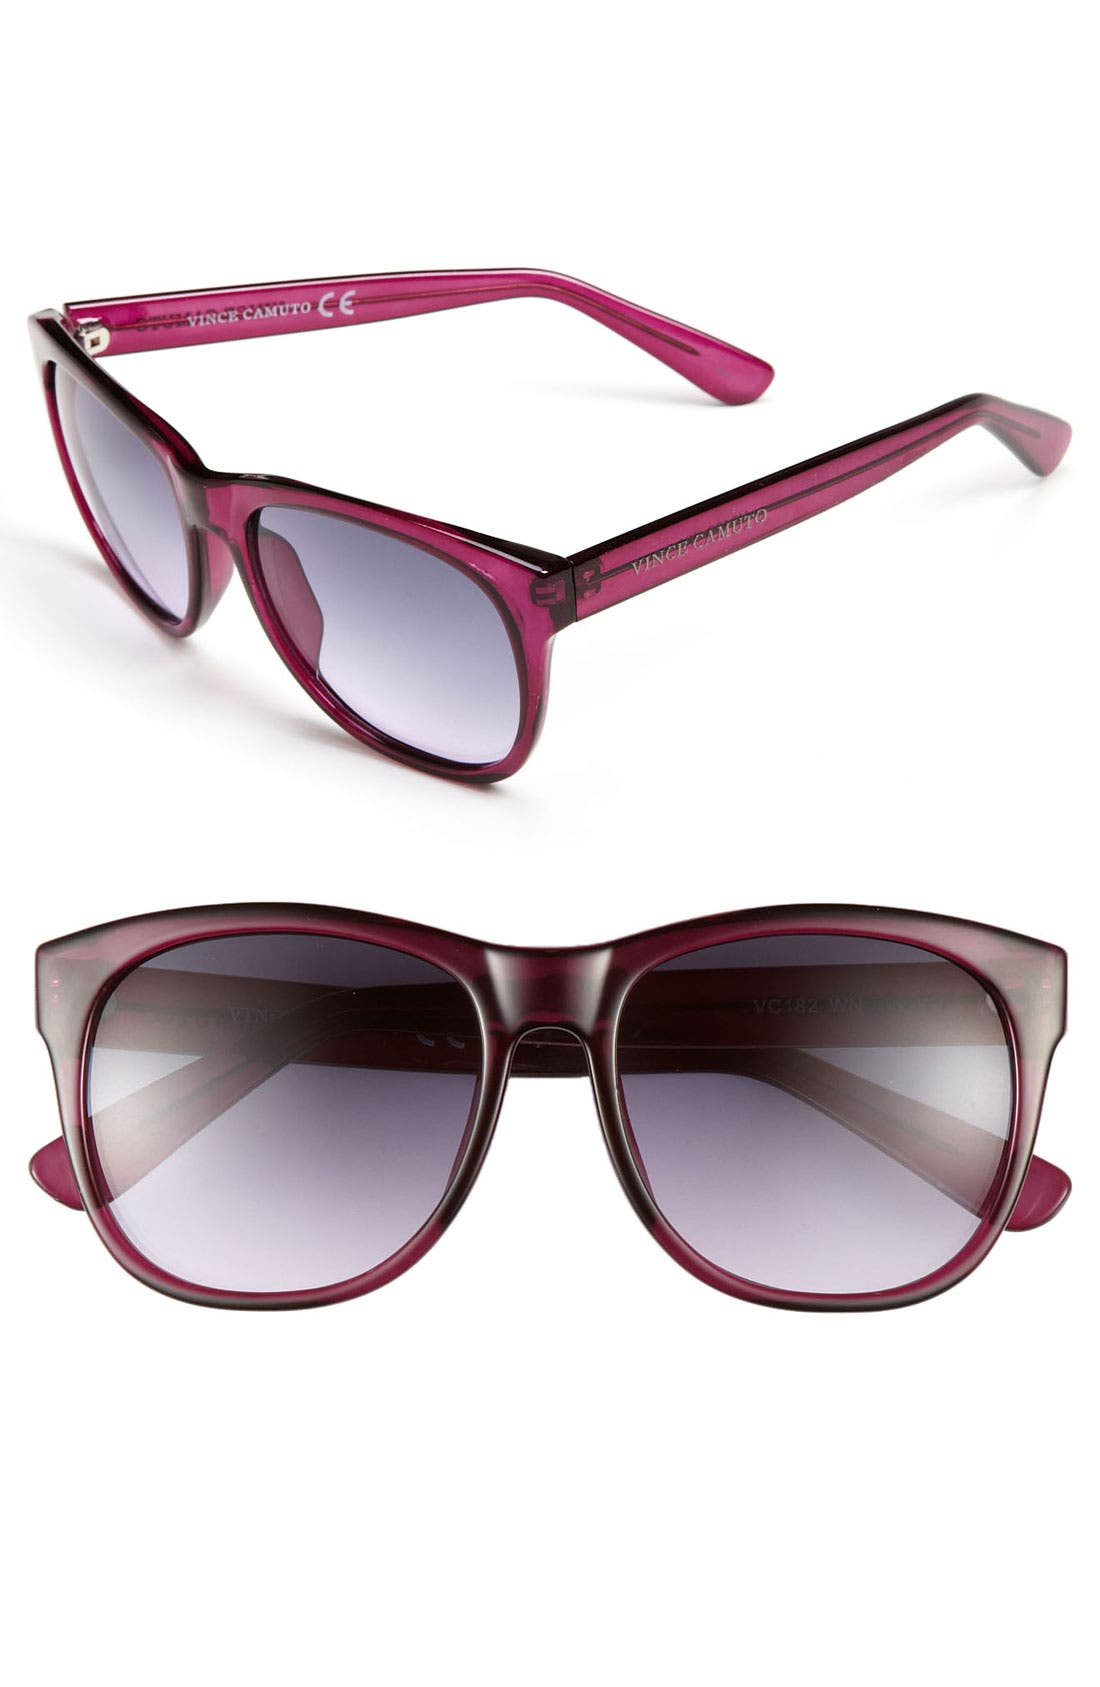 Main Image - Vince Camuto 55mm Oversized Sunglasses